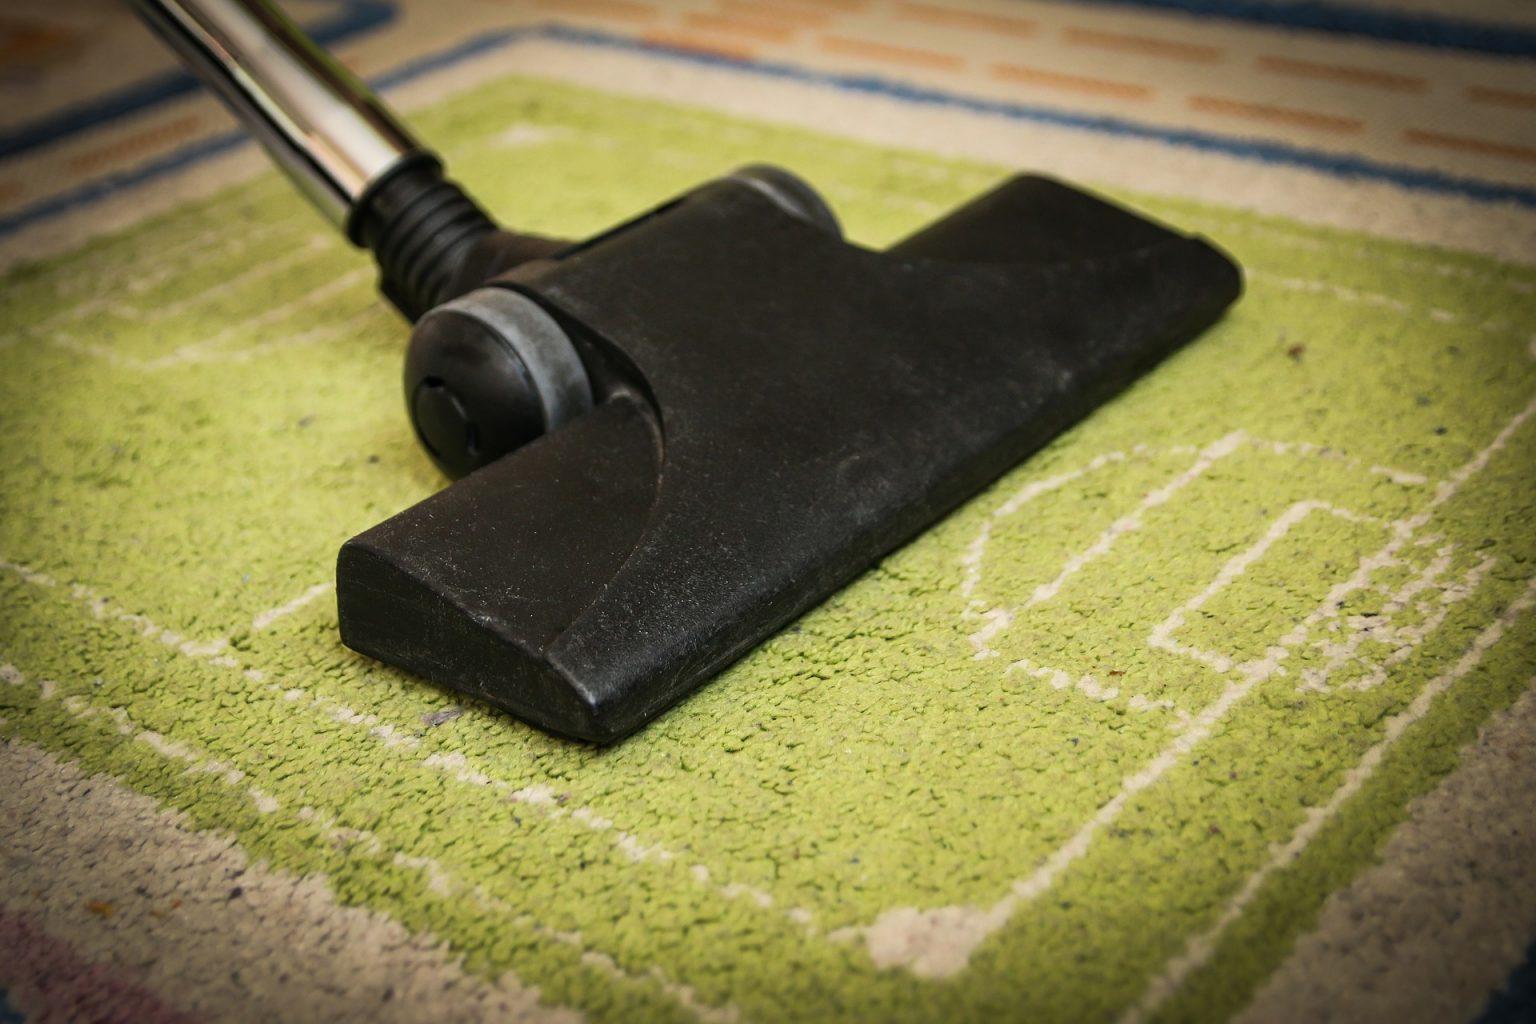 chica aspirando alfombra